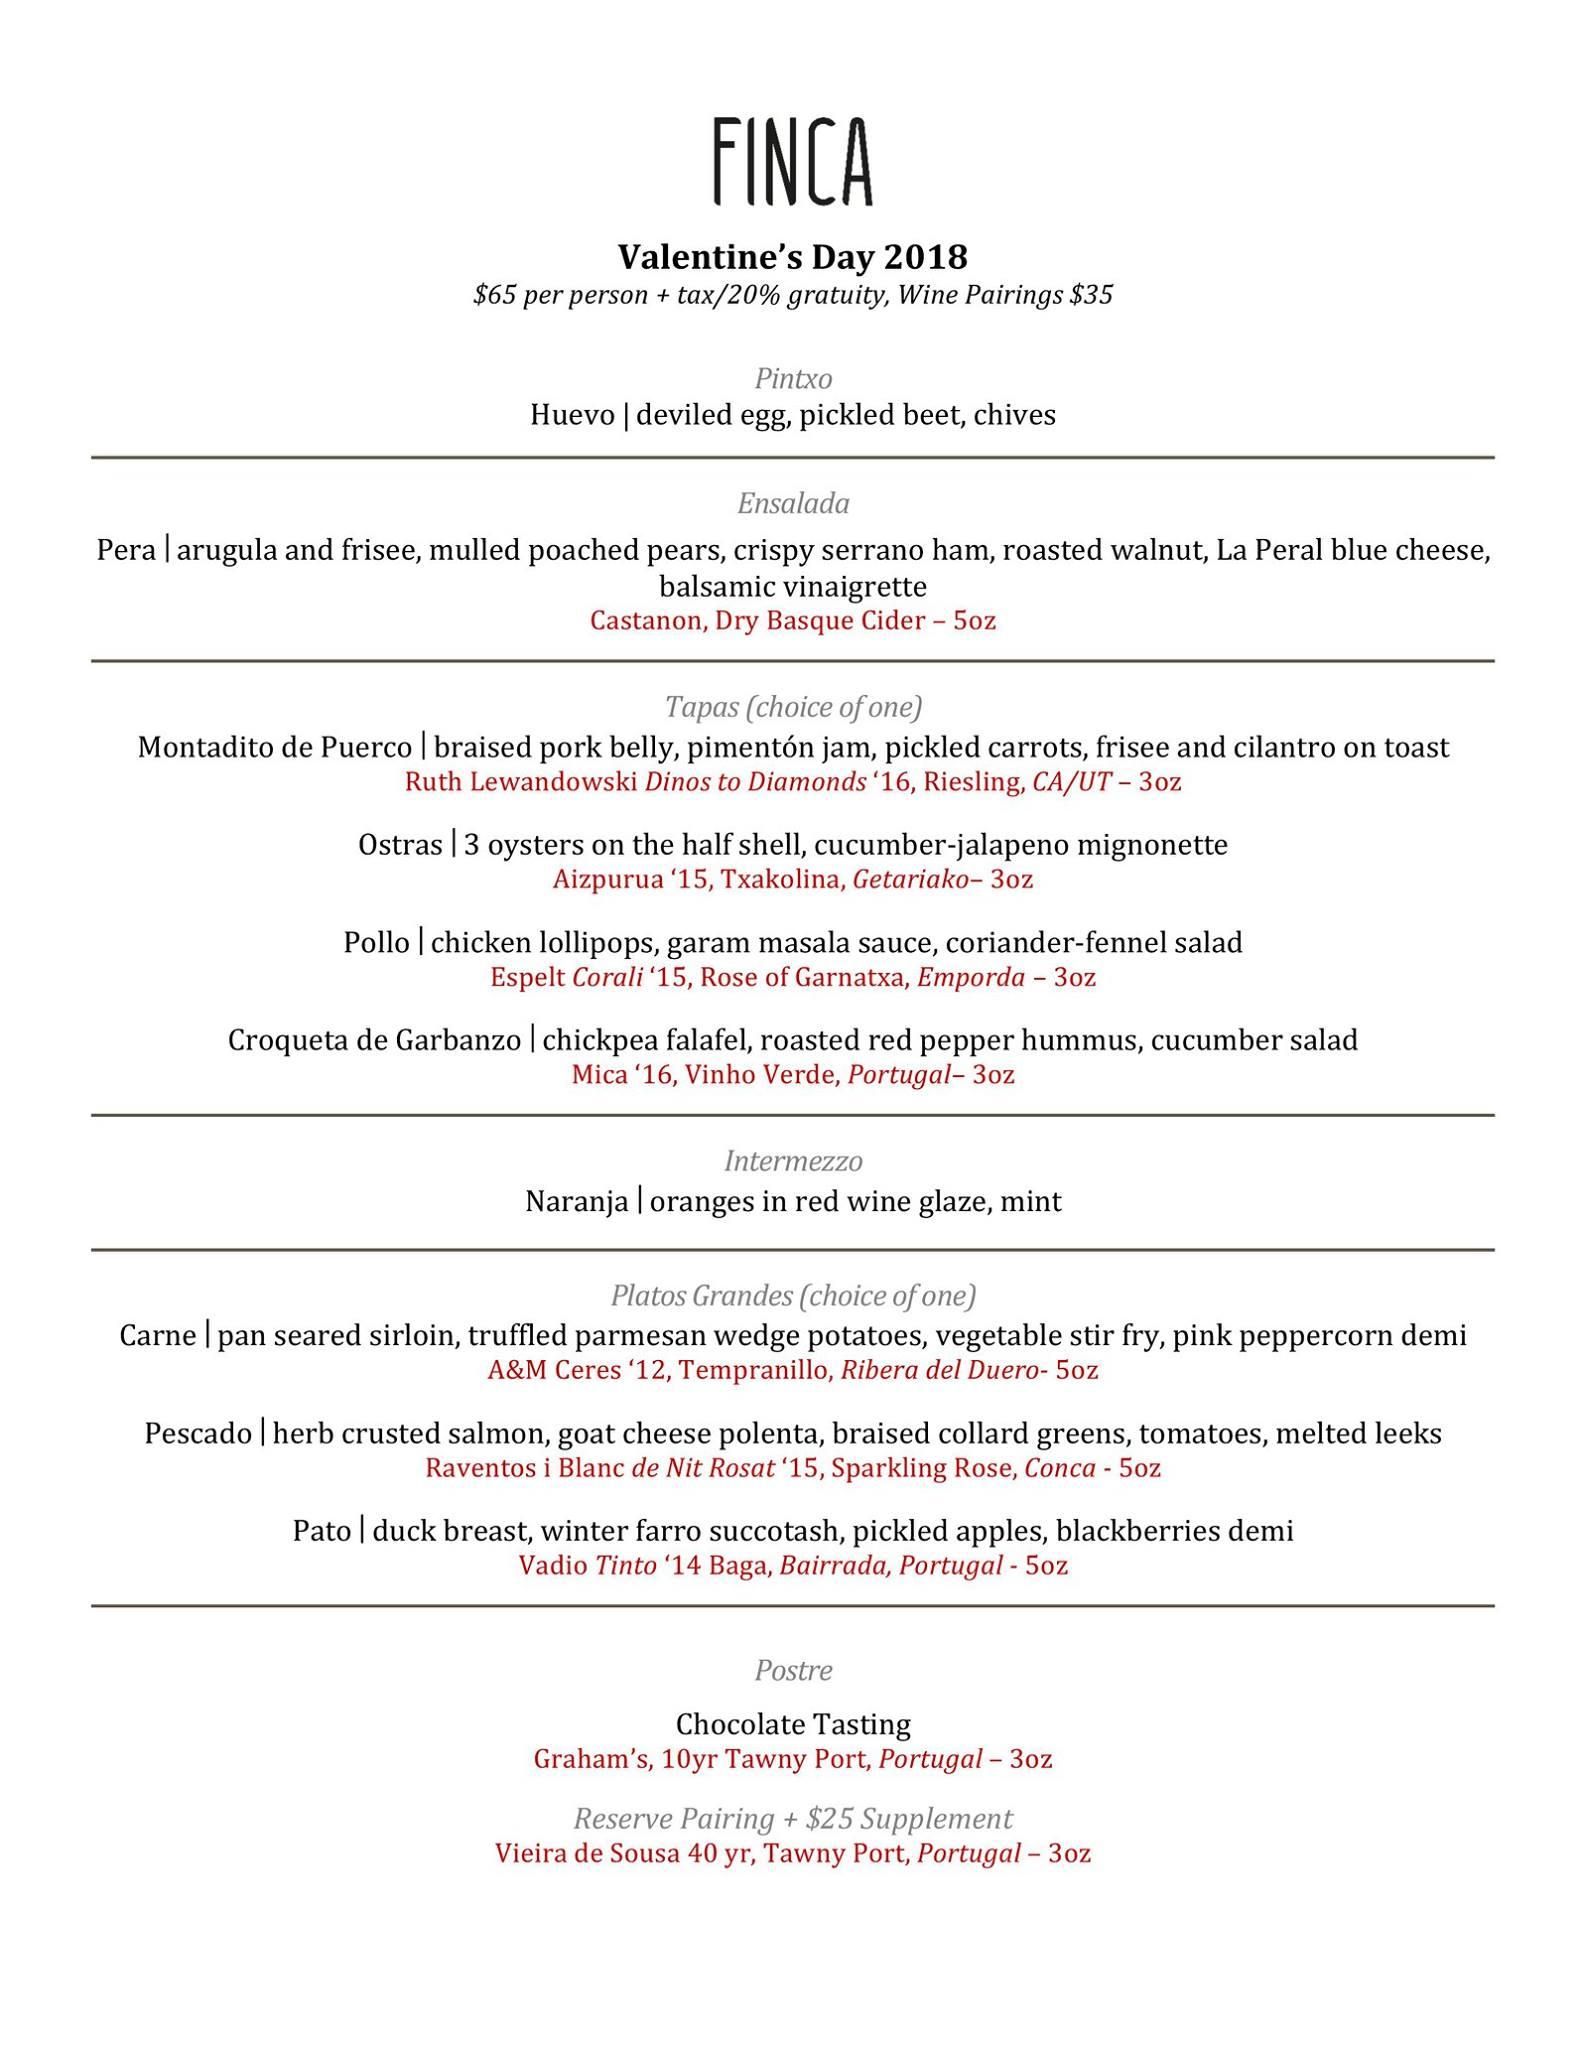 Finca Valentines Day 2018 menu